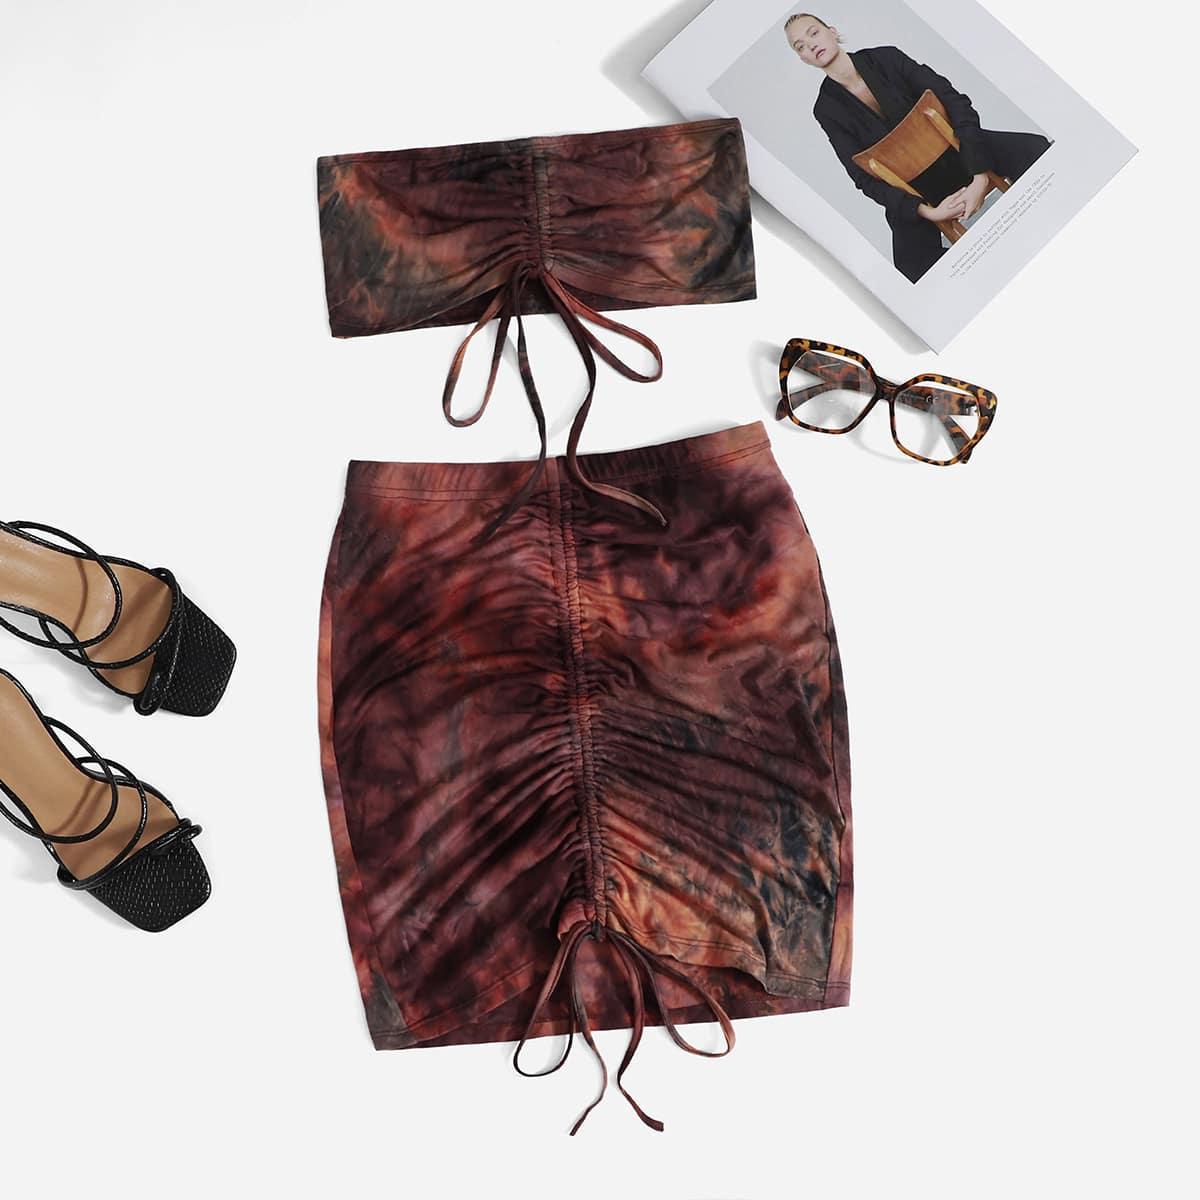 Drawstring Ruched Tube Top & Tie Dye Skirt Set